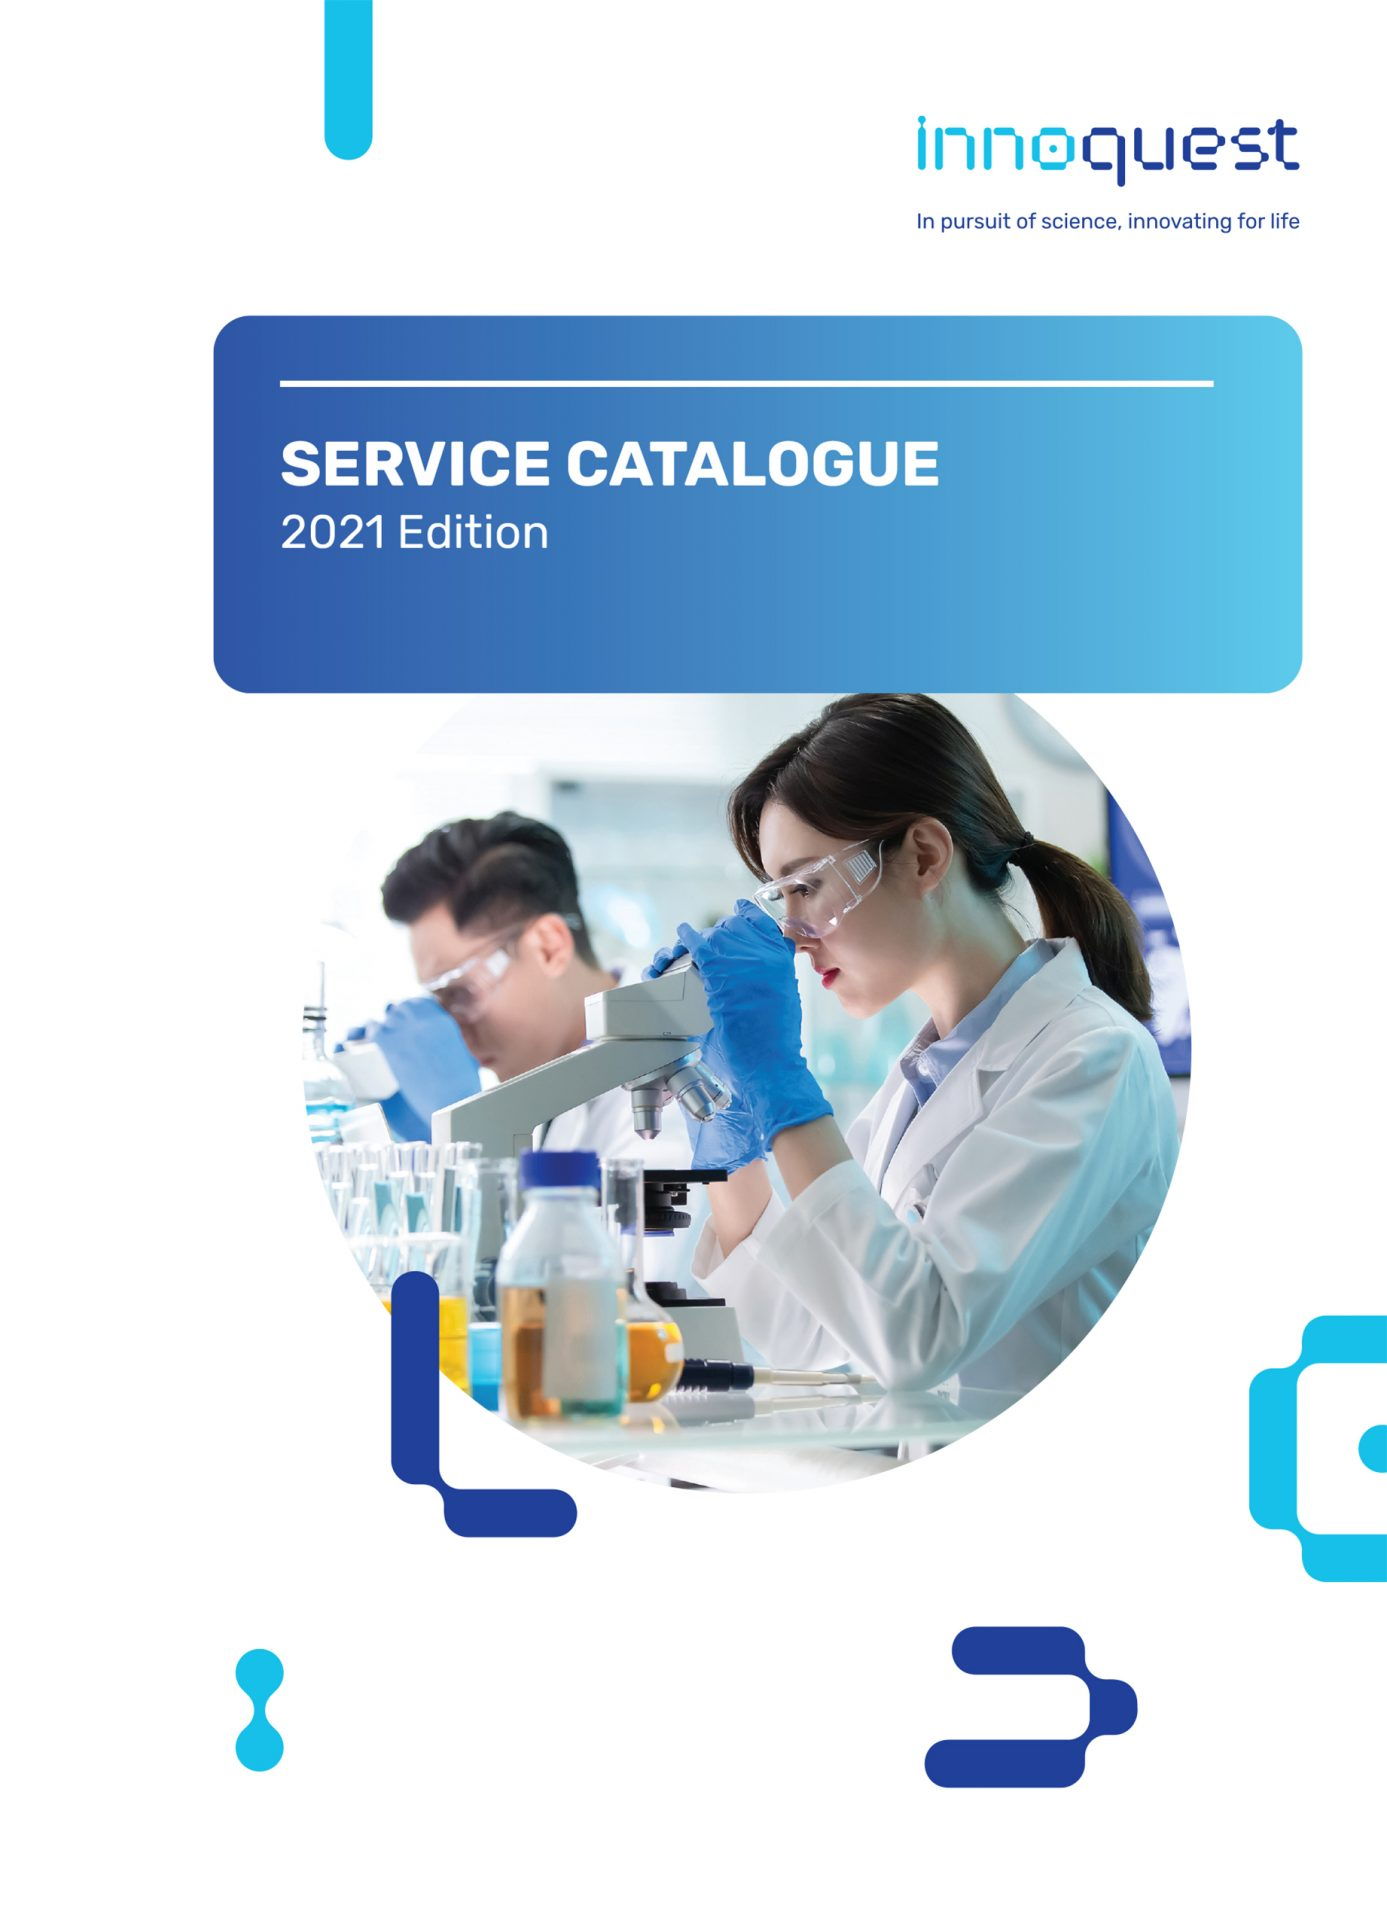 Innoquest Service Catalogue image